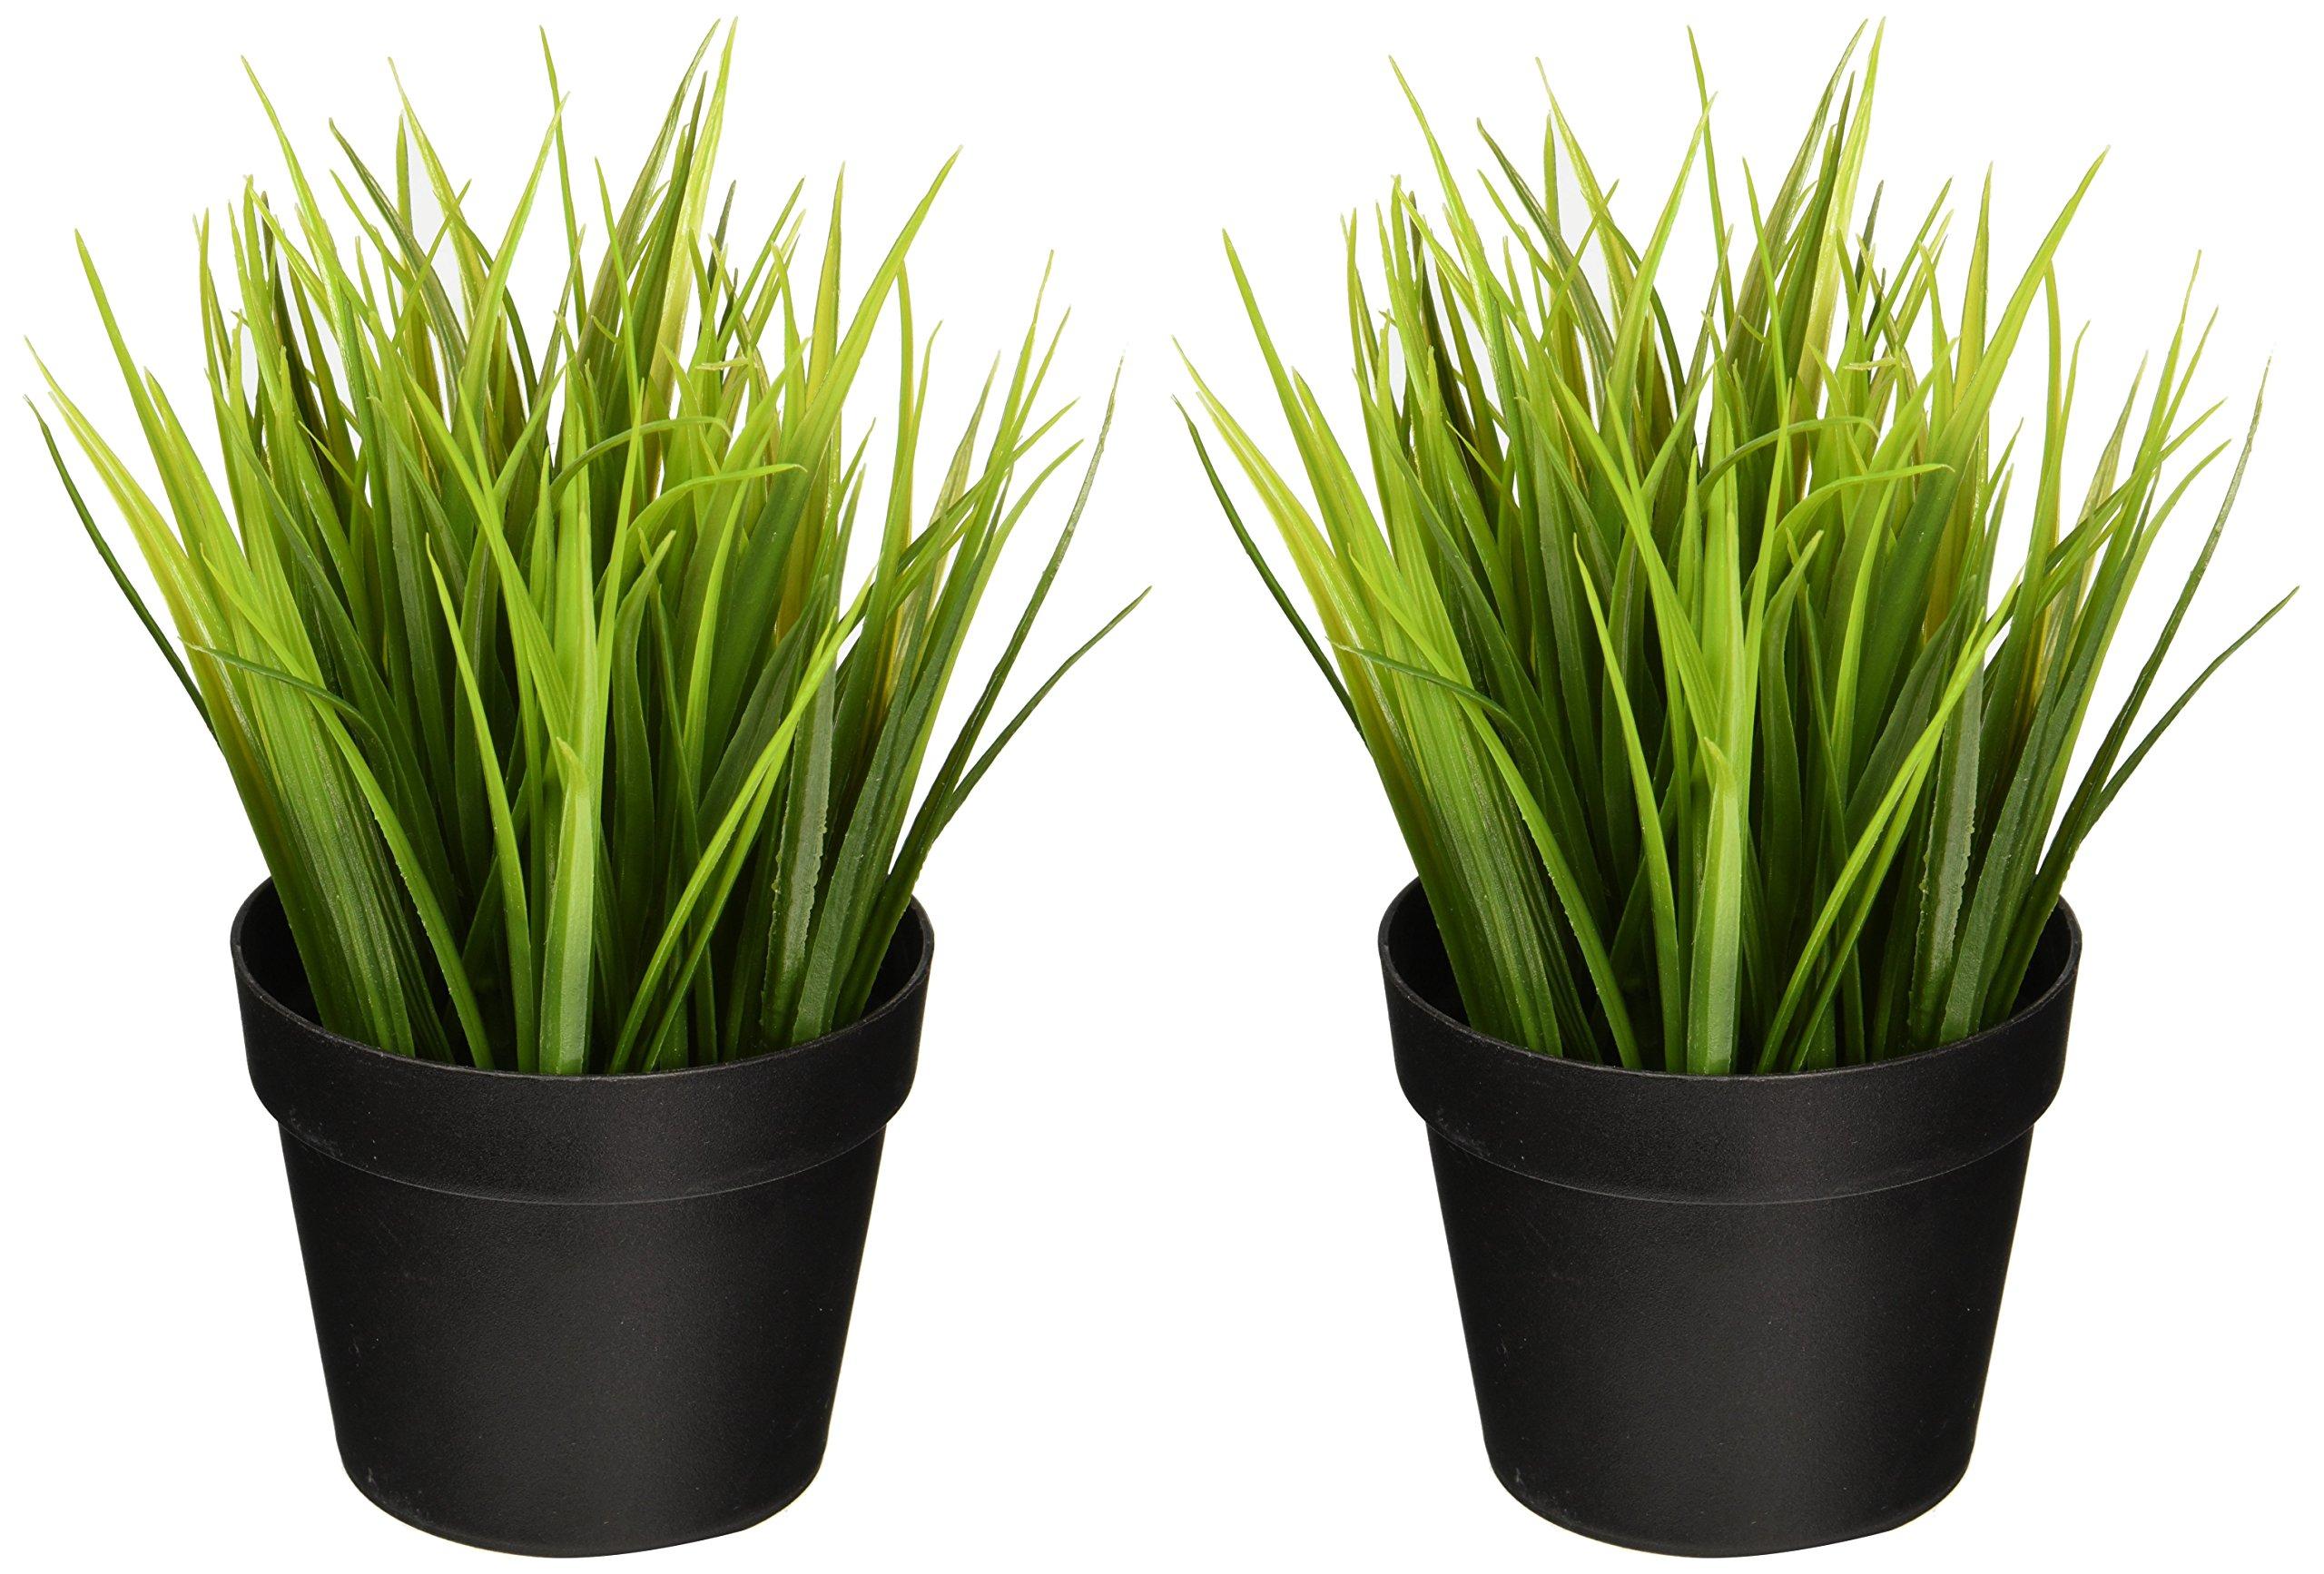 Ikea Artificial Potted Plant Wheat Grass 9'' Lifelike Nature Houseplant Decoration Fejka (SET OF 2) by Ikea Artificial Potted Plant